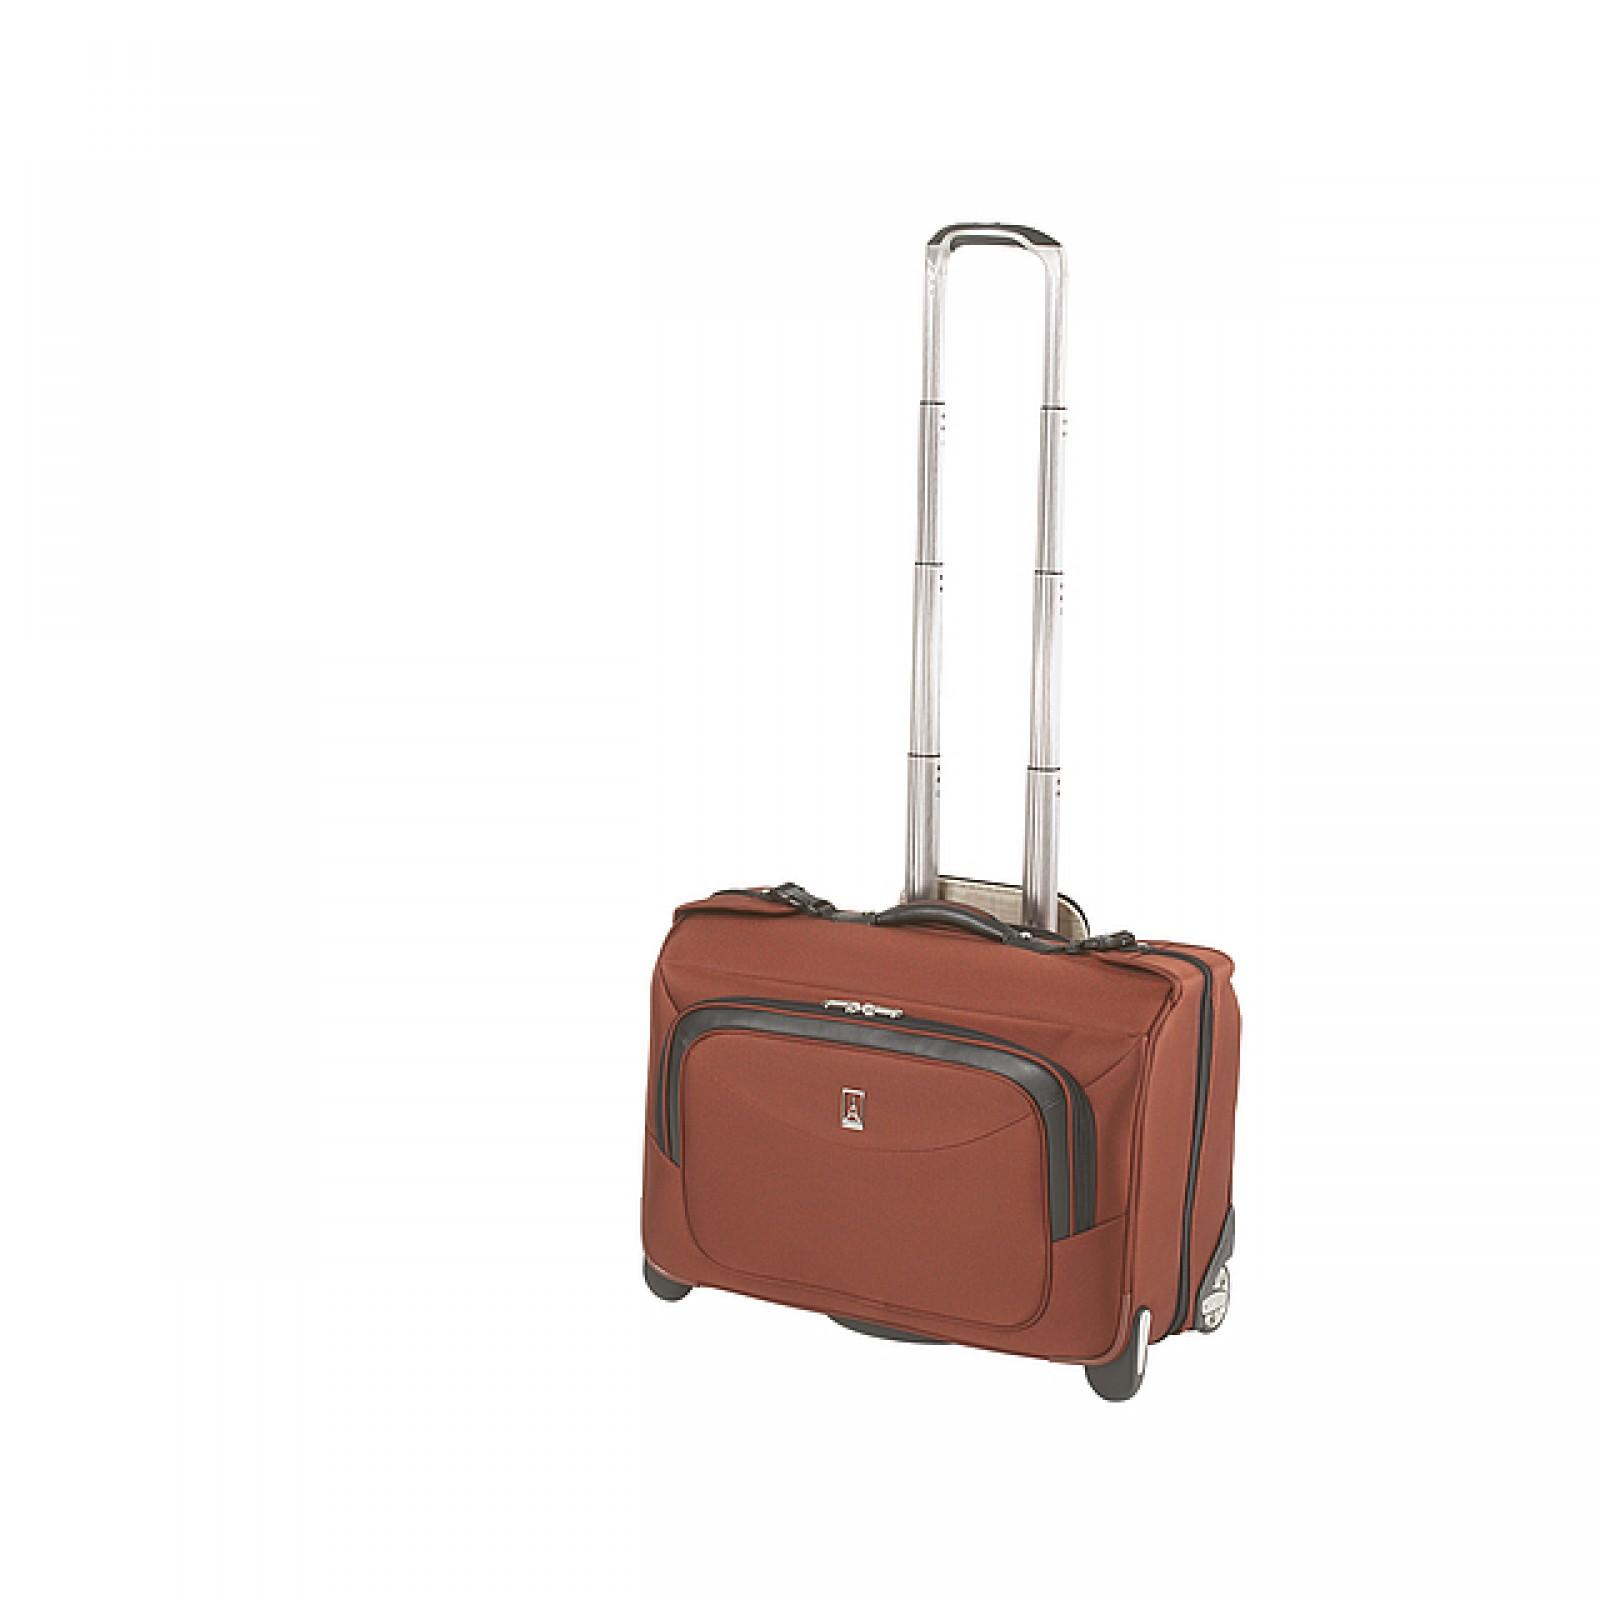 Carry On Luggage 22x14x9 Lookup Beforebuying